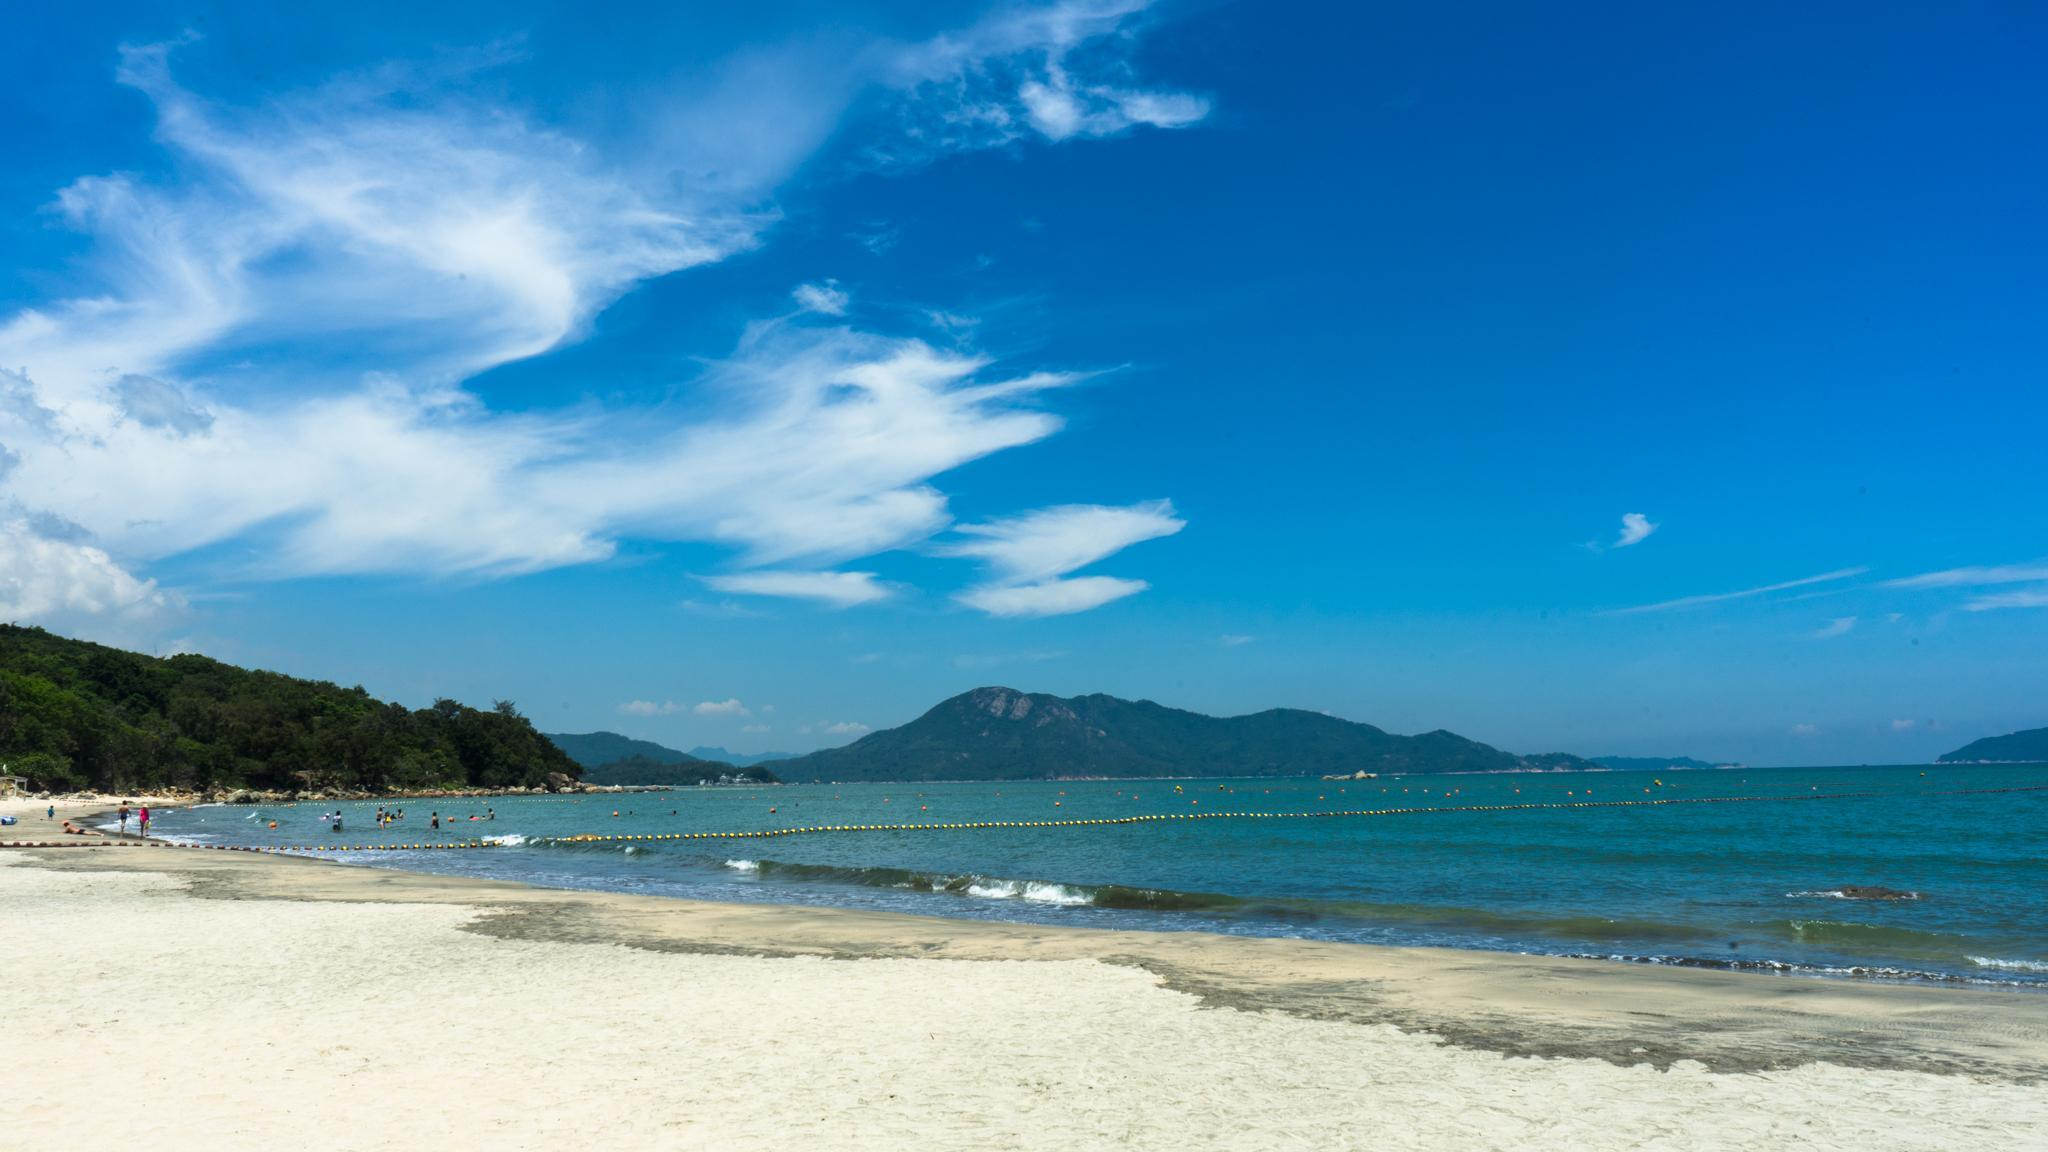 The Cove Hostel - Tong Fuk Sea Lion, Lantau Islands